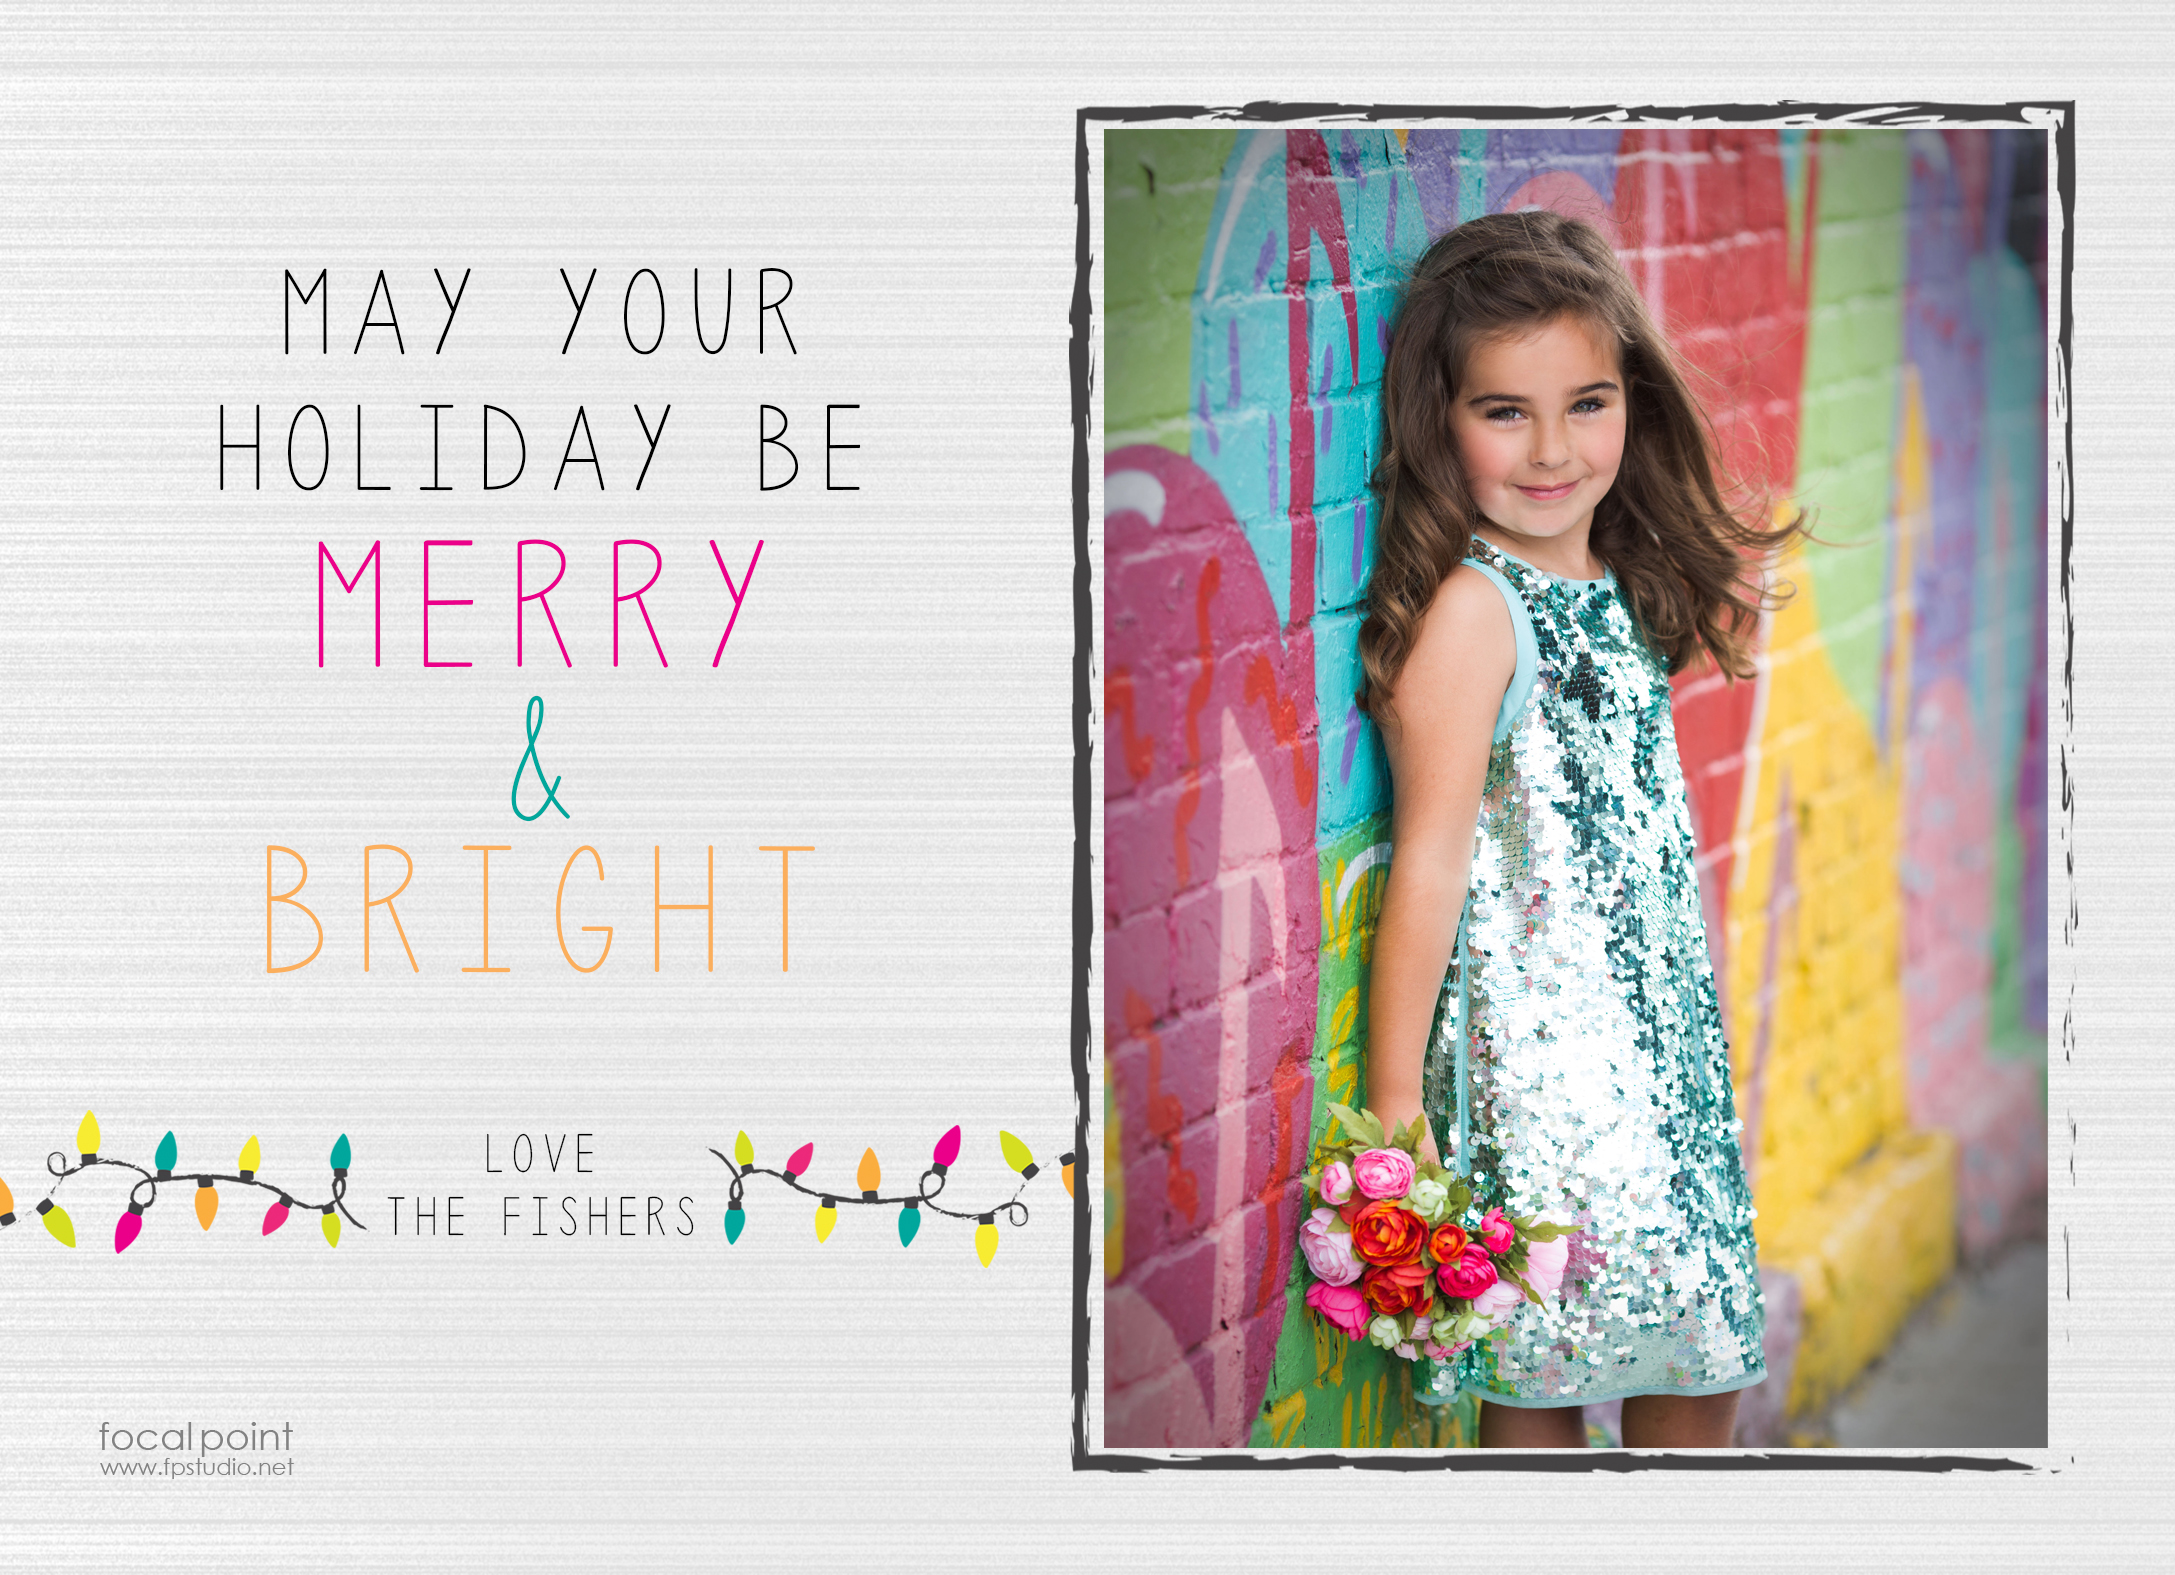 Merry & Bright (H)